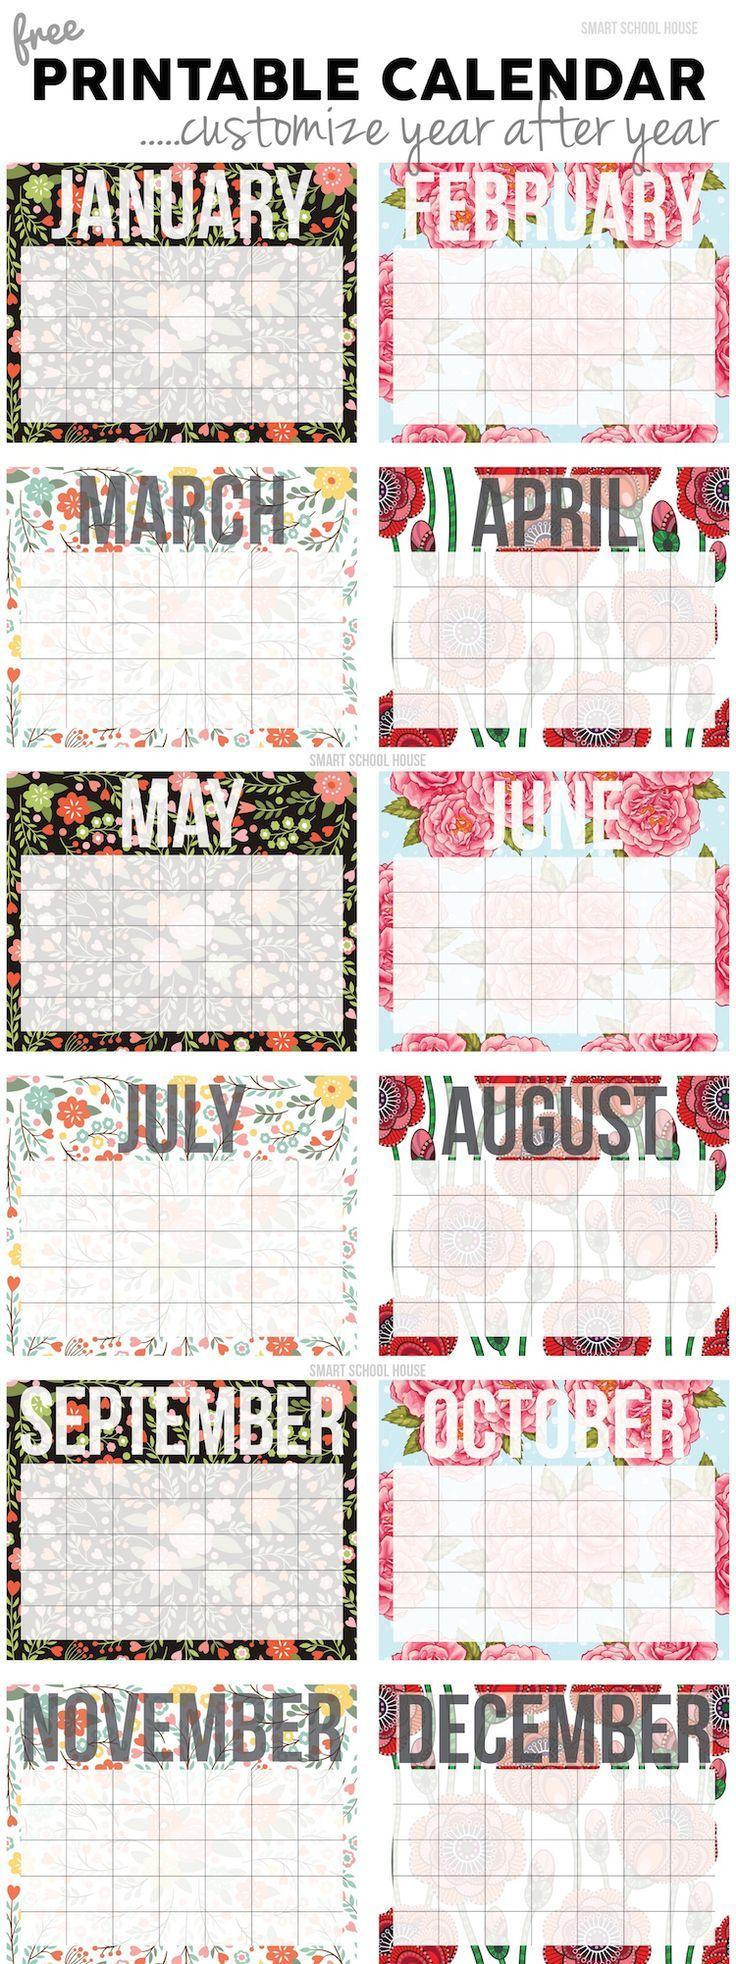 2015 free printable calendar: